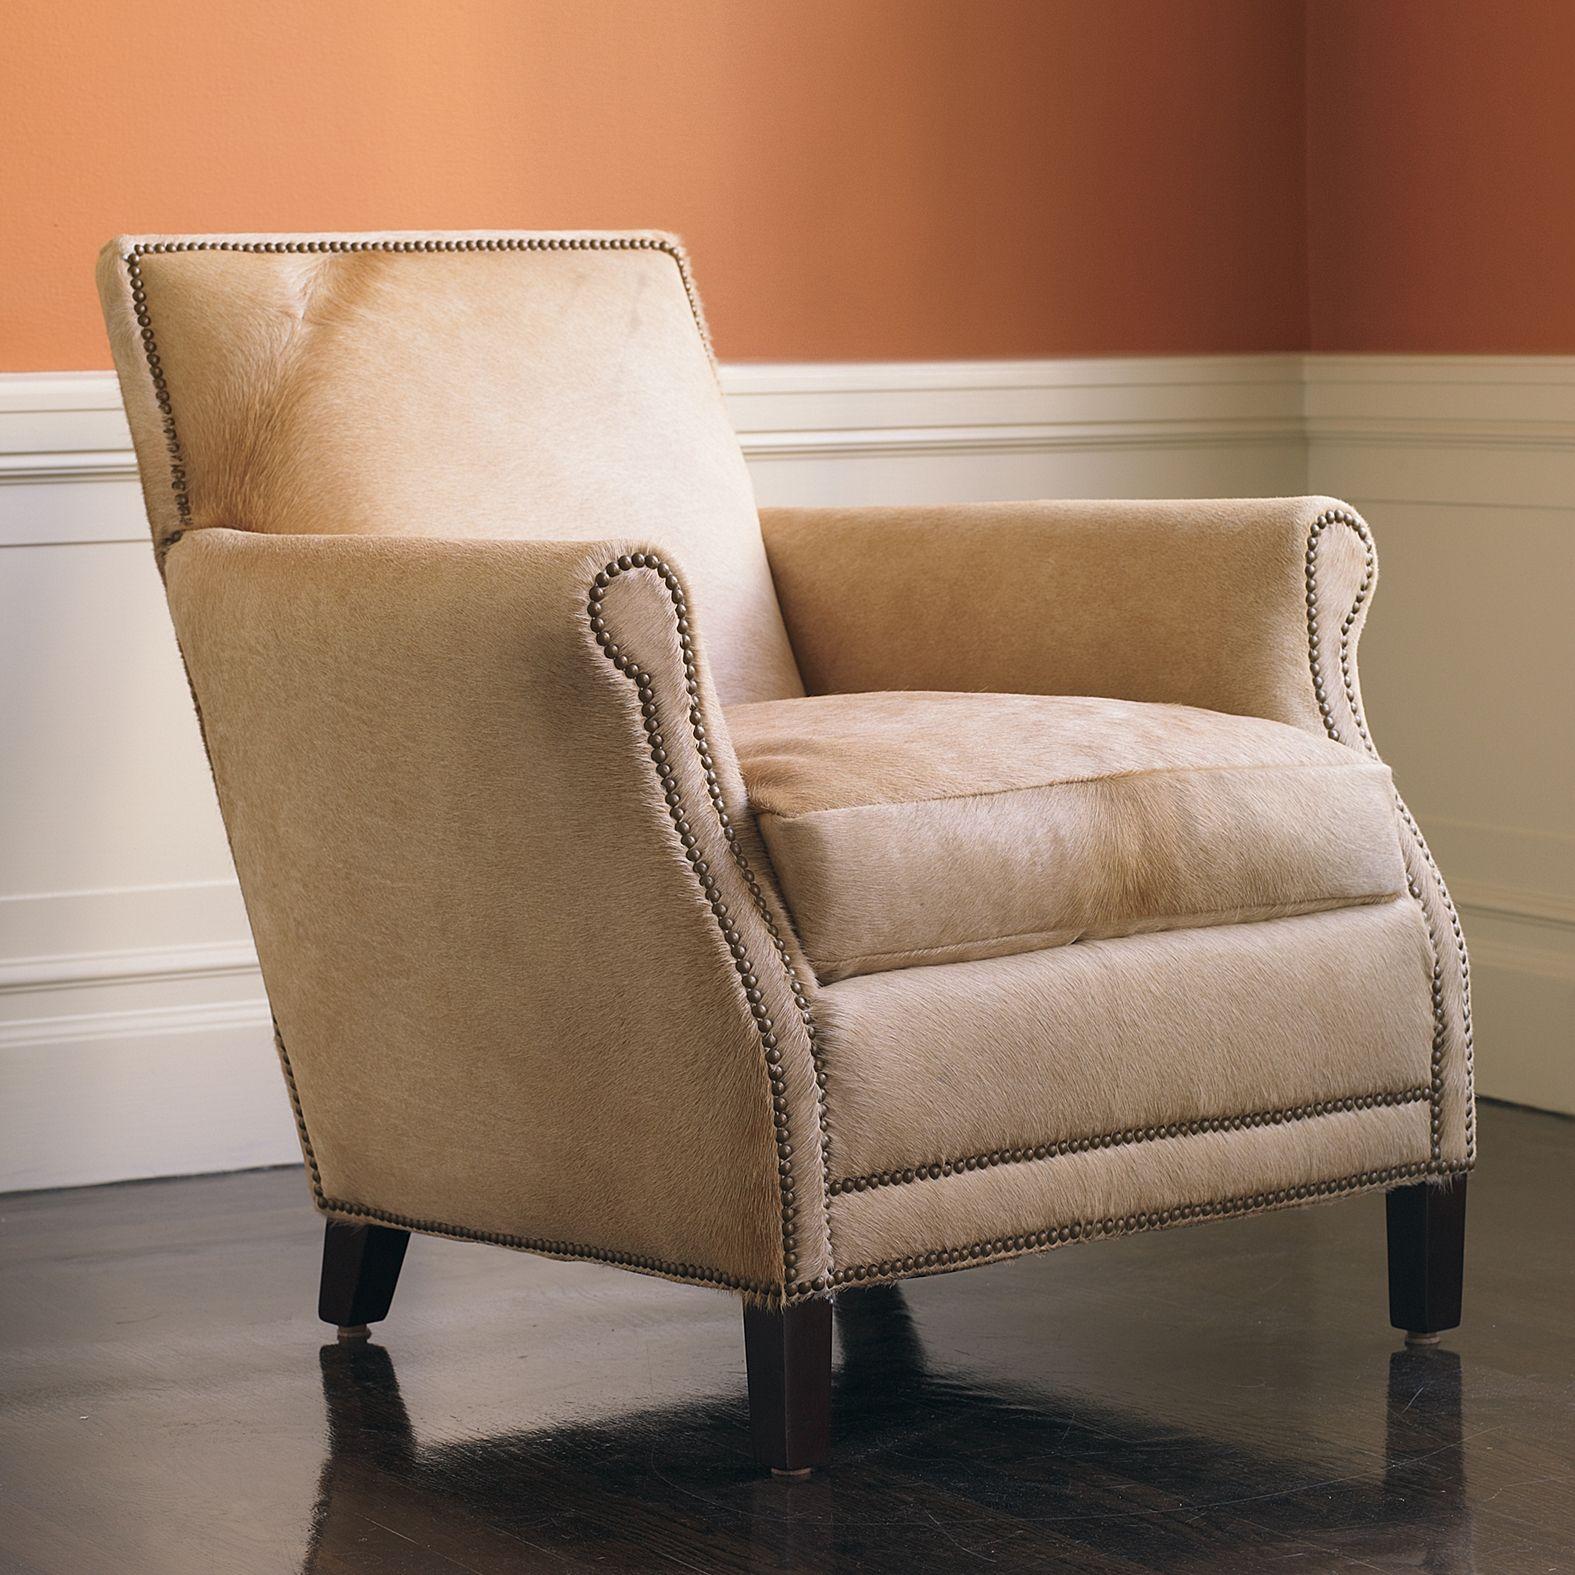 Canyon Chair Serena & Lily Cowhide chair, Chair, Home